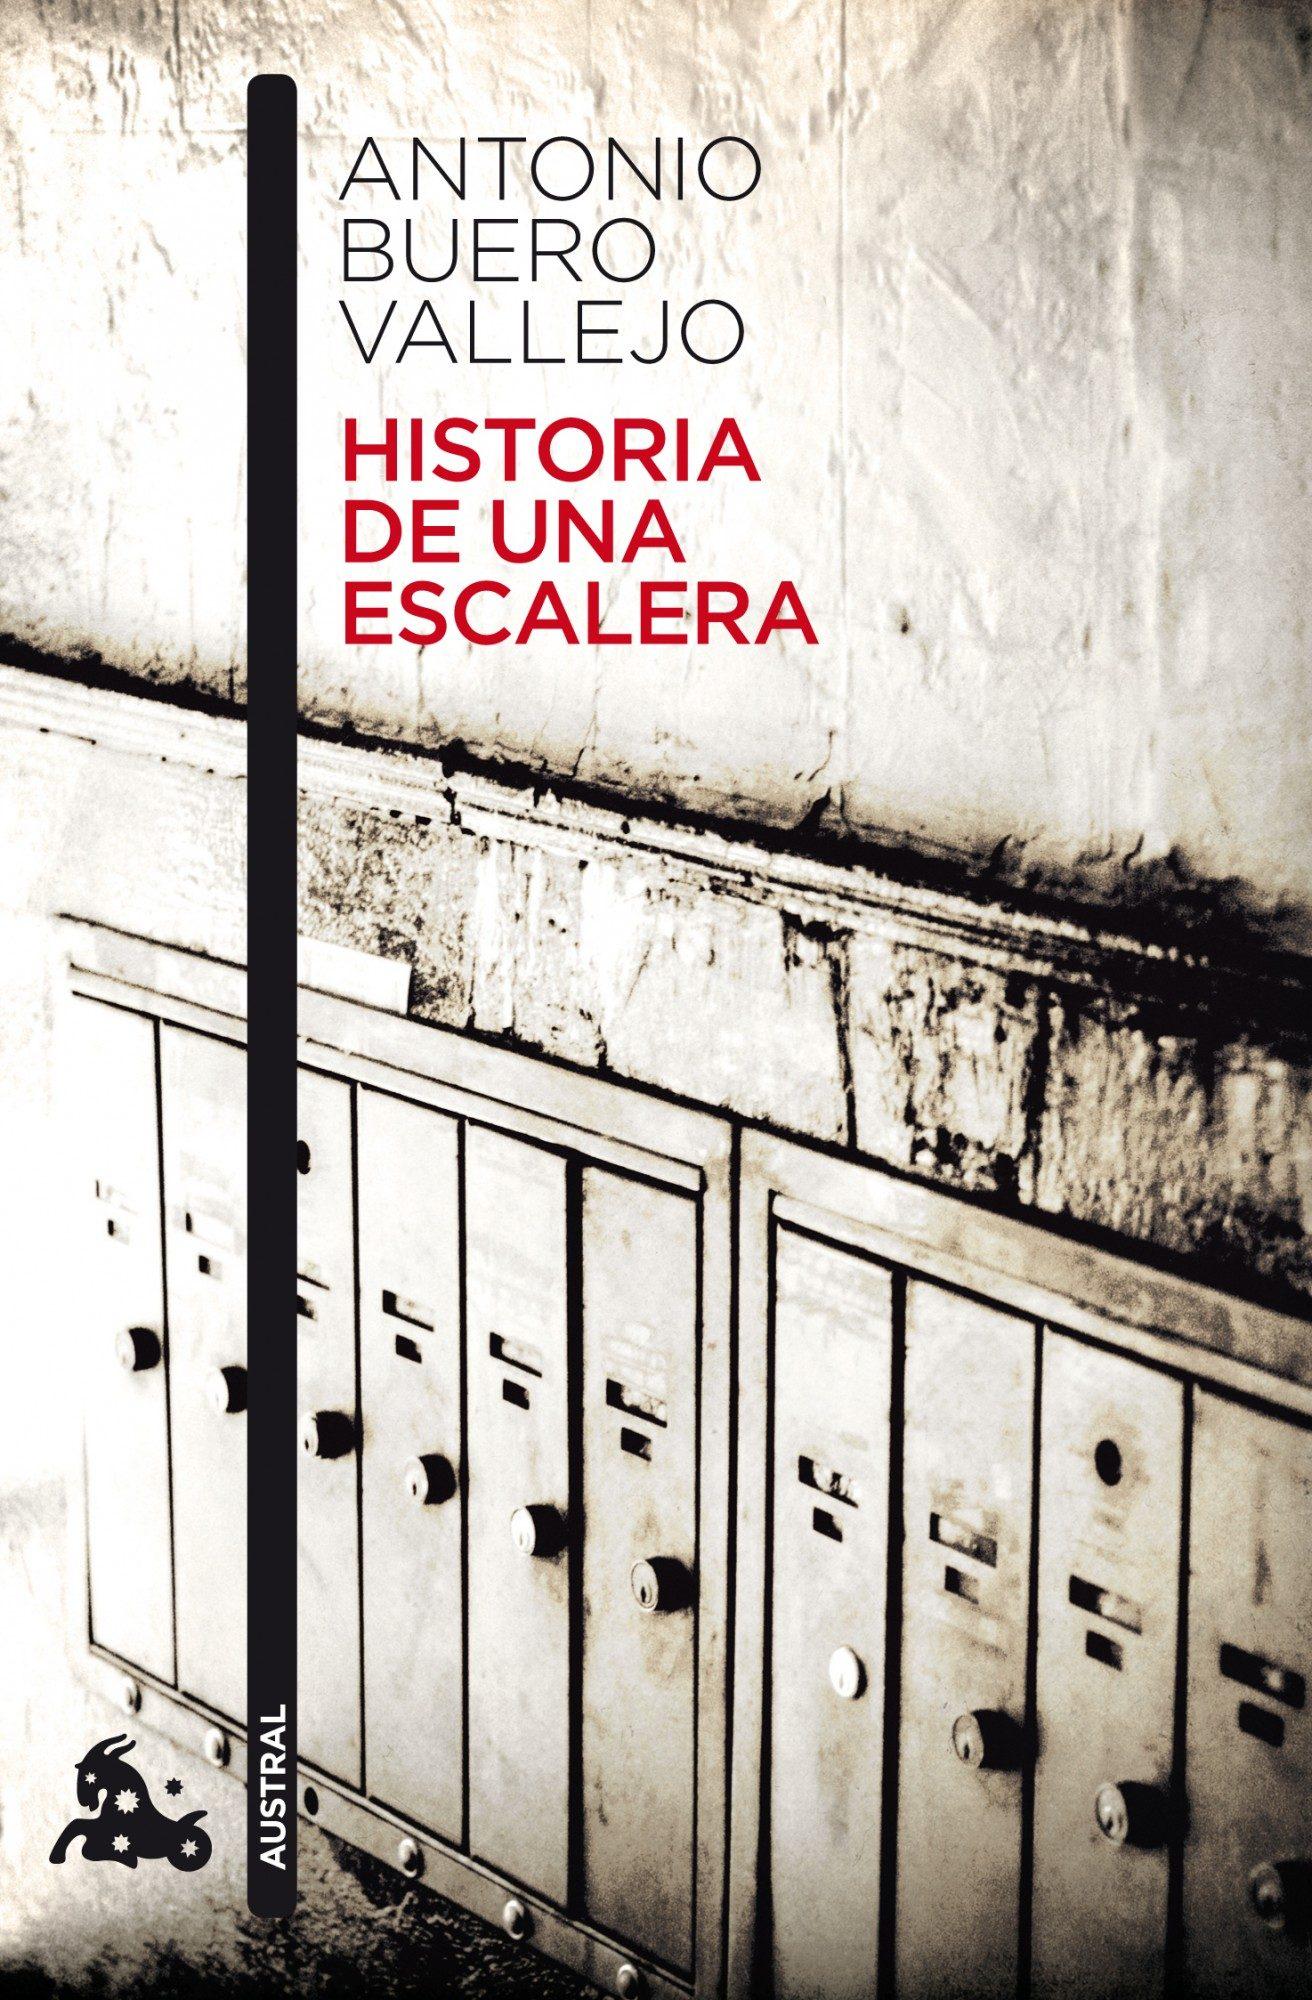 historia-escalera-buero-vallejo.jpg